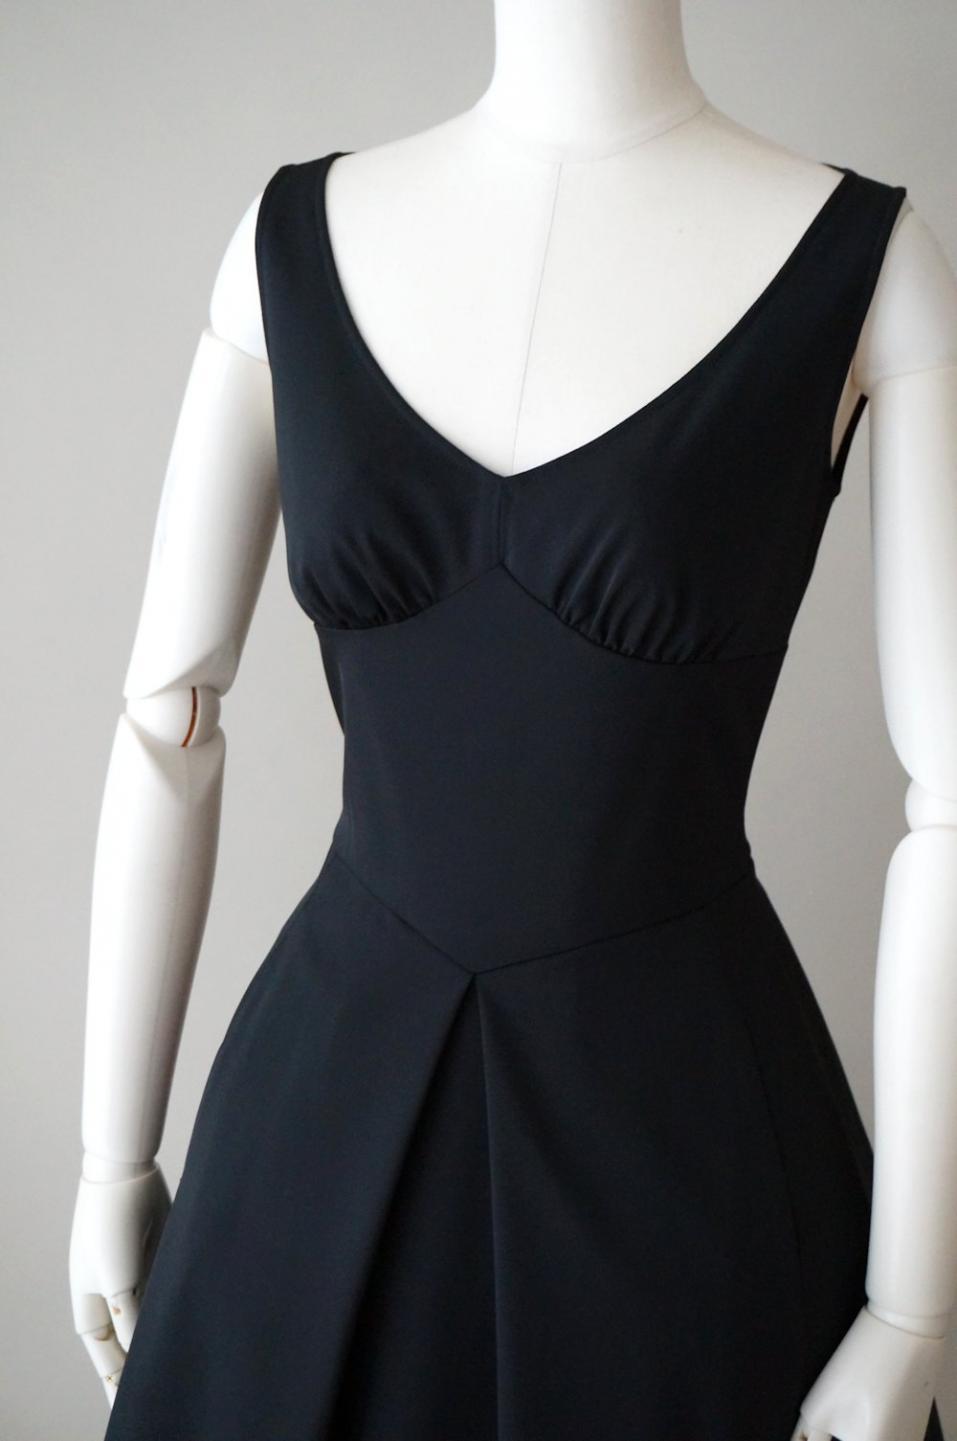 8d3c8e0f0f08a フォクシー フレアーワンピースドレス   レンタルリトルブラックドレス ...